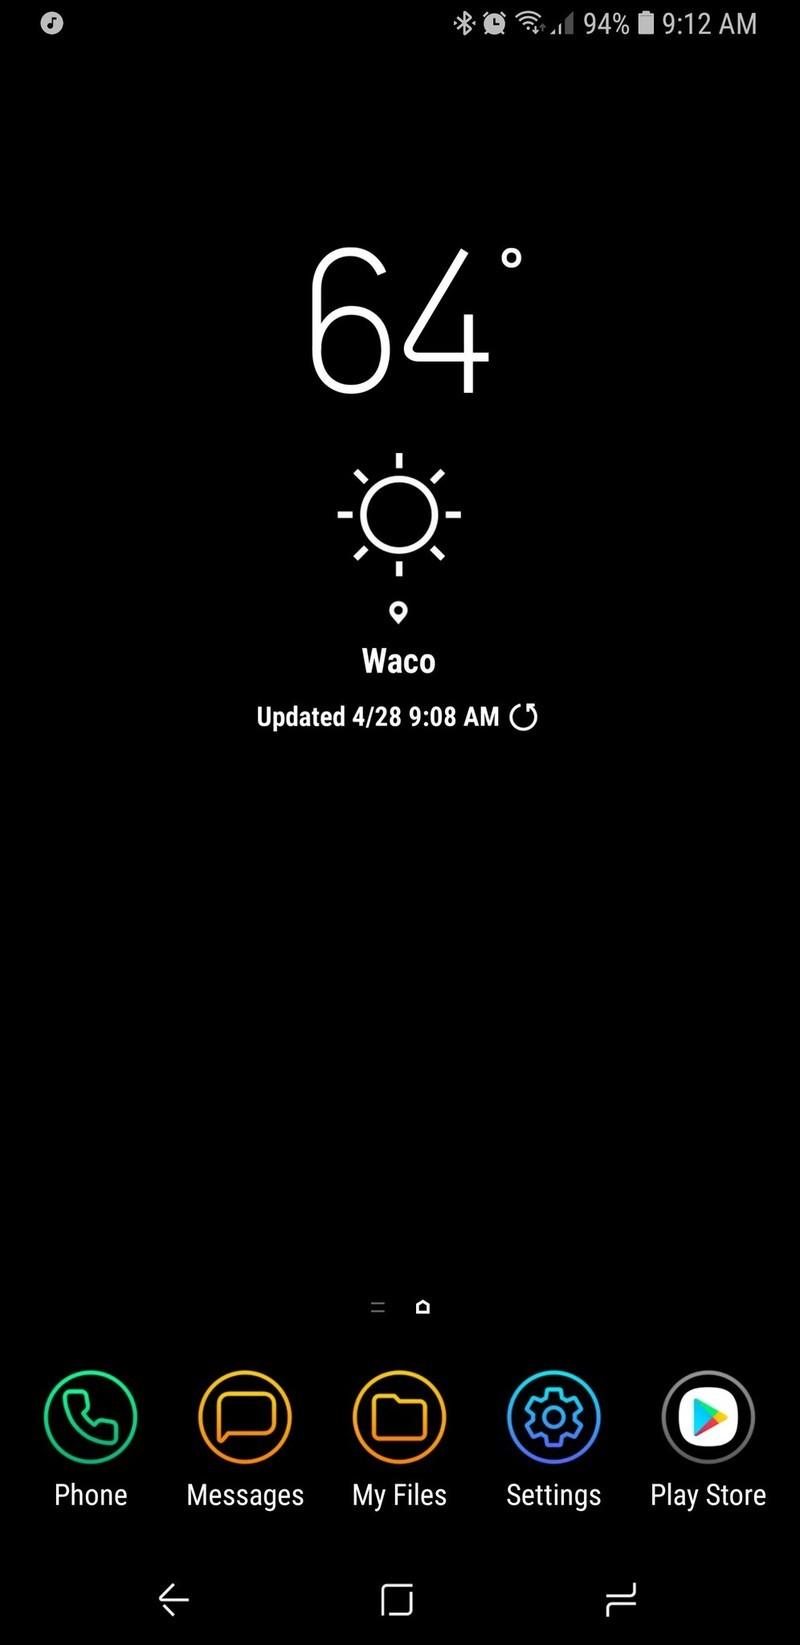 samsung-dual-audio-gs9plus-1.jpg?itok=5d